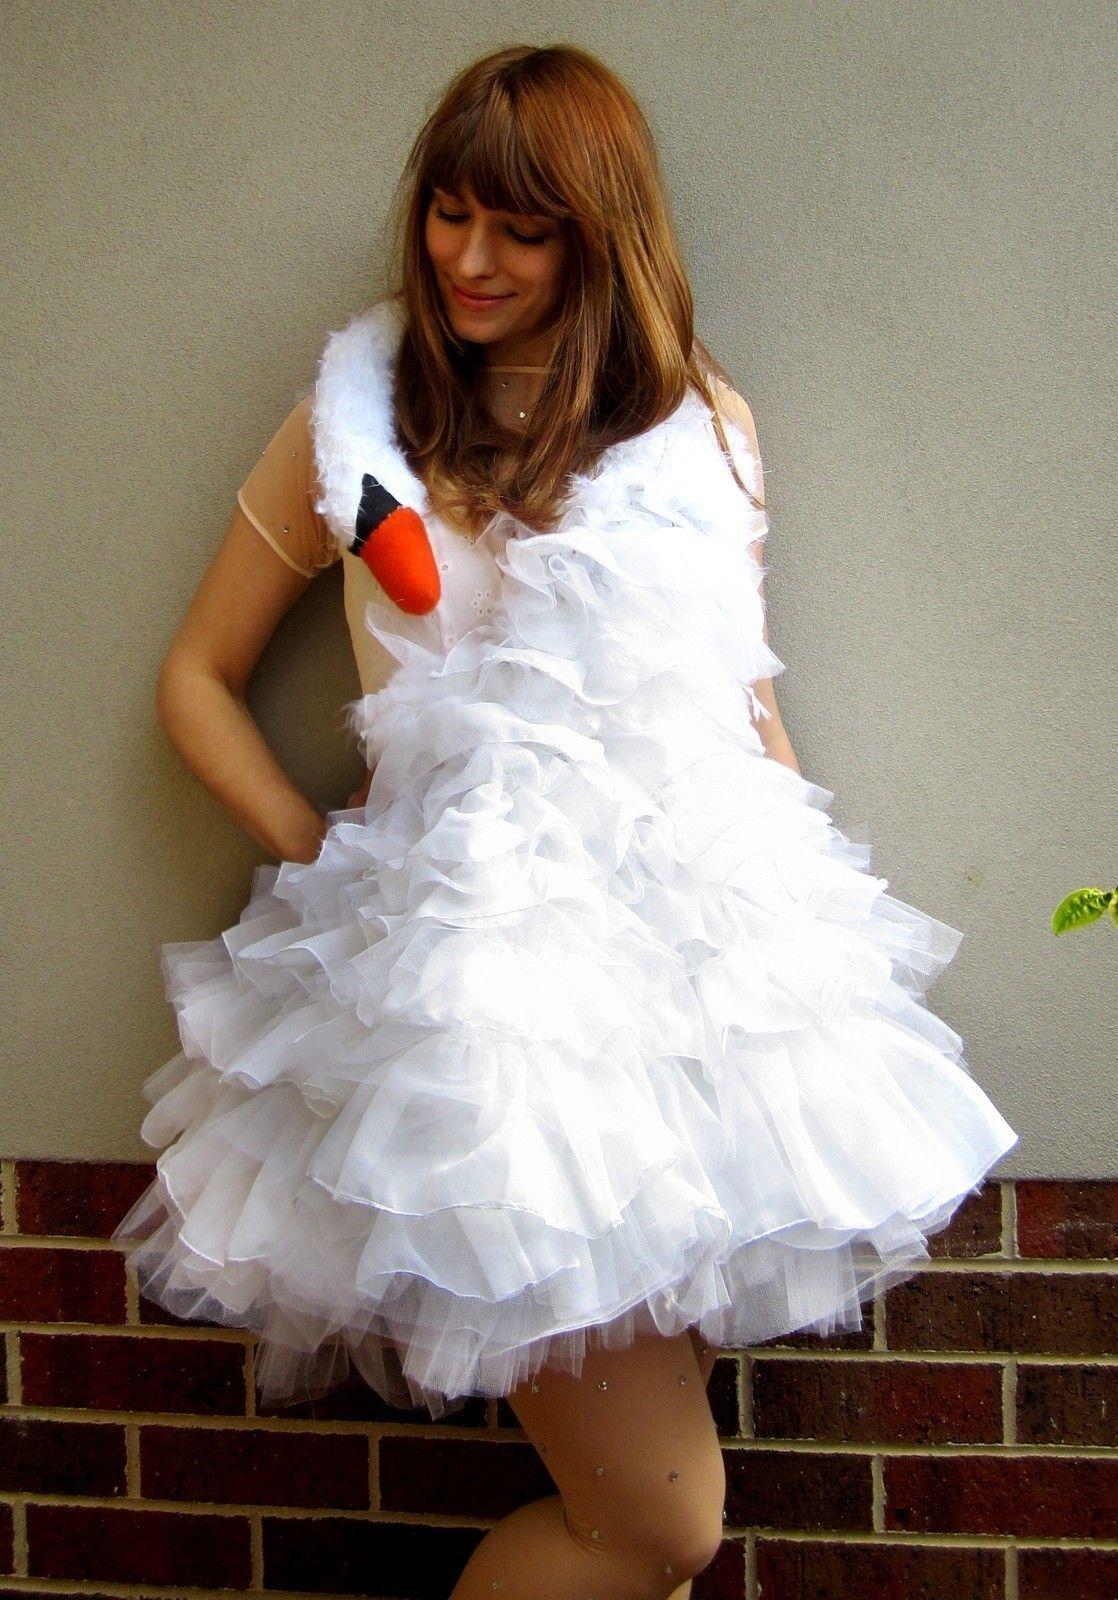 Bjork Swan Dress Dresses, Costume dress, Diy dress